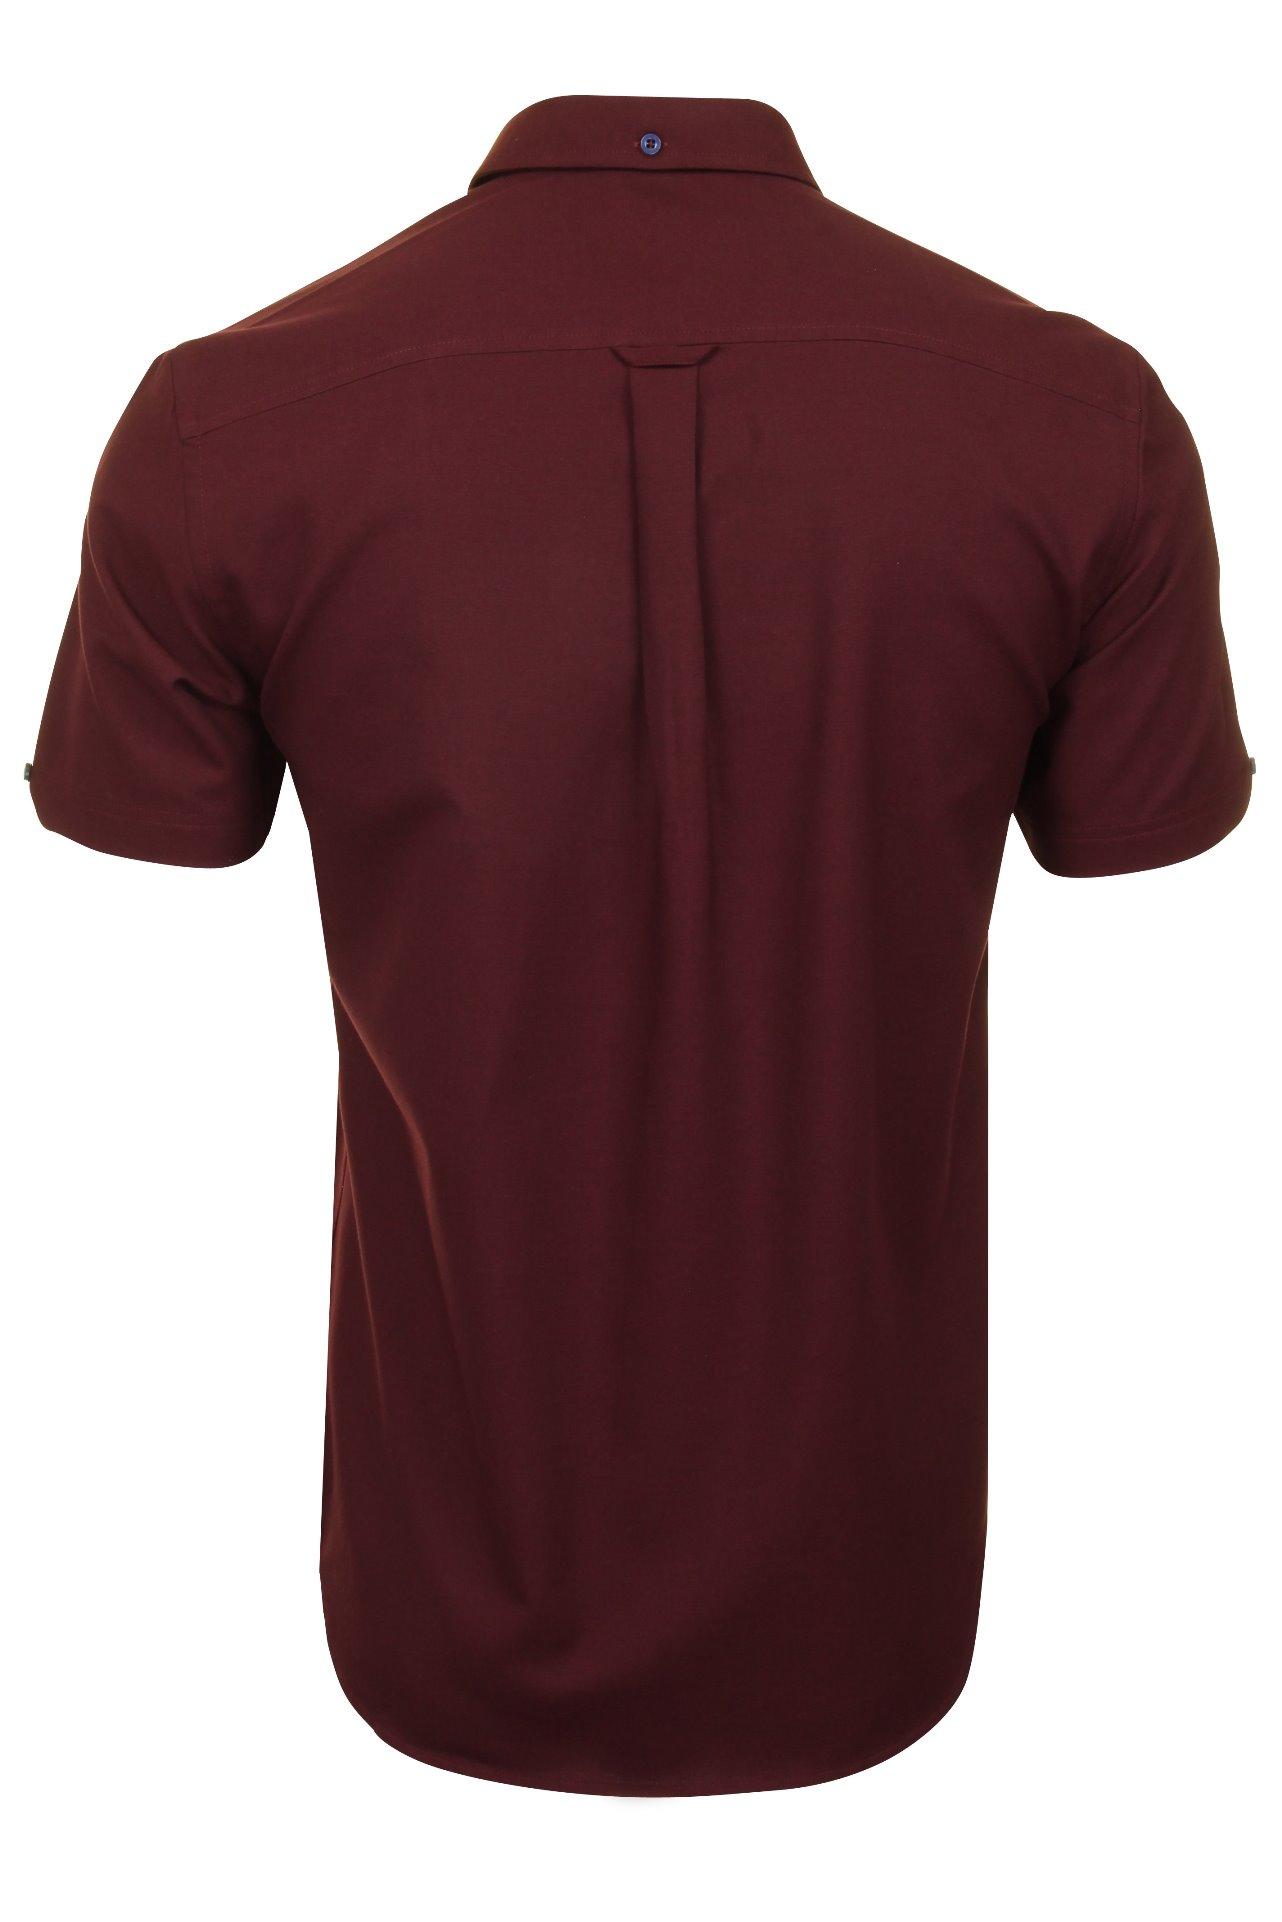 Ben-Sherman-Mens-Oxford-Shirt-Short-Sleeve thumbnail 12